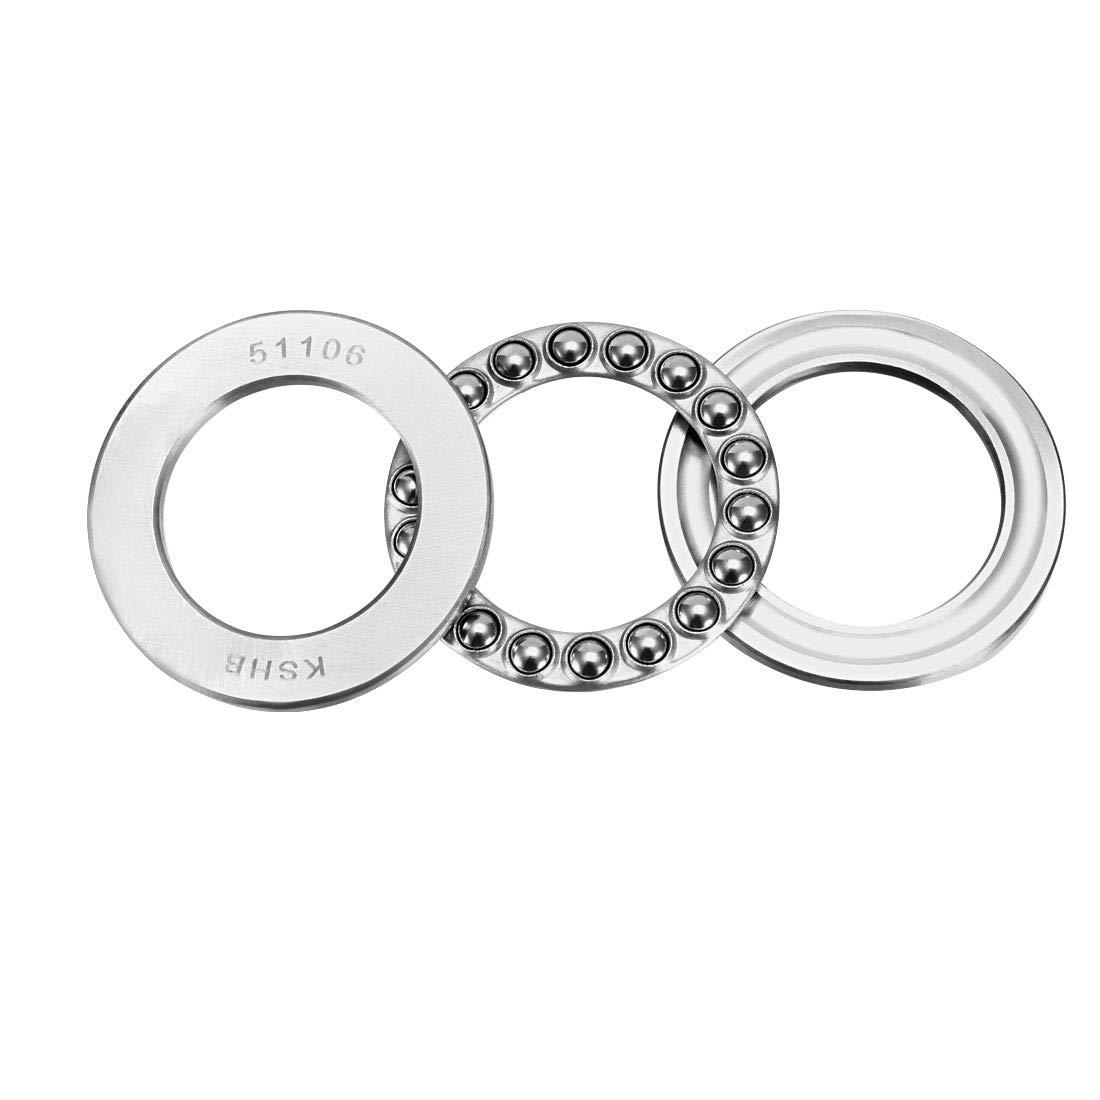 sourcingmap 51106 Single Direction Thrust Ball Bearings 30mm x 47mm x 11mm Chrome Steel a18062000ux0239